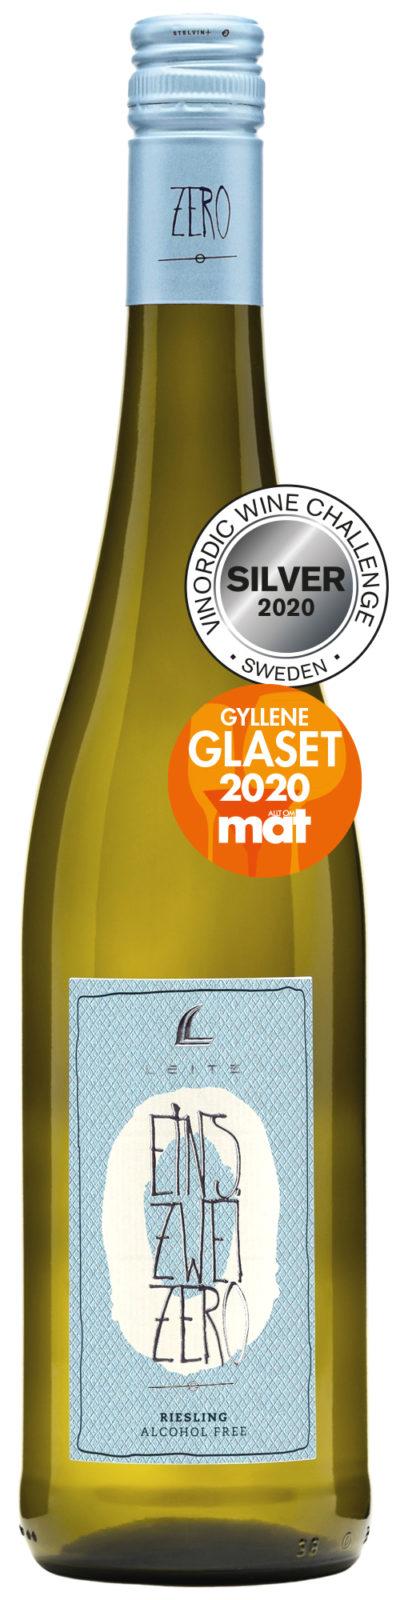 Leitz Eins Zwei Zero - Gyllene Glaset 2020